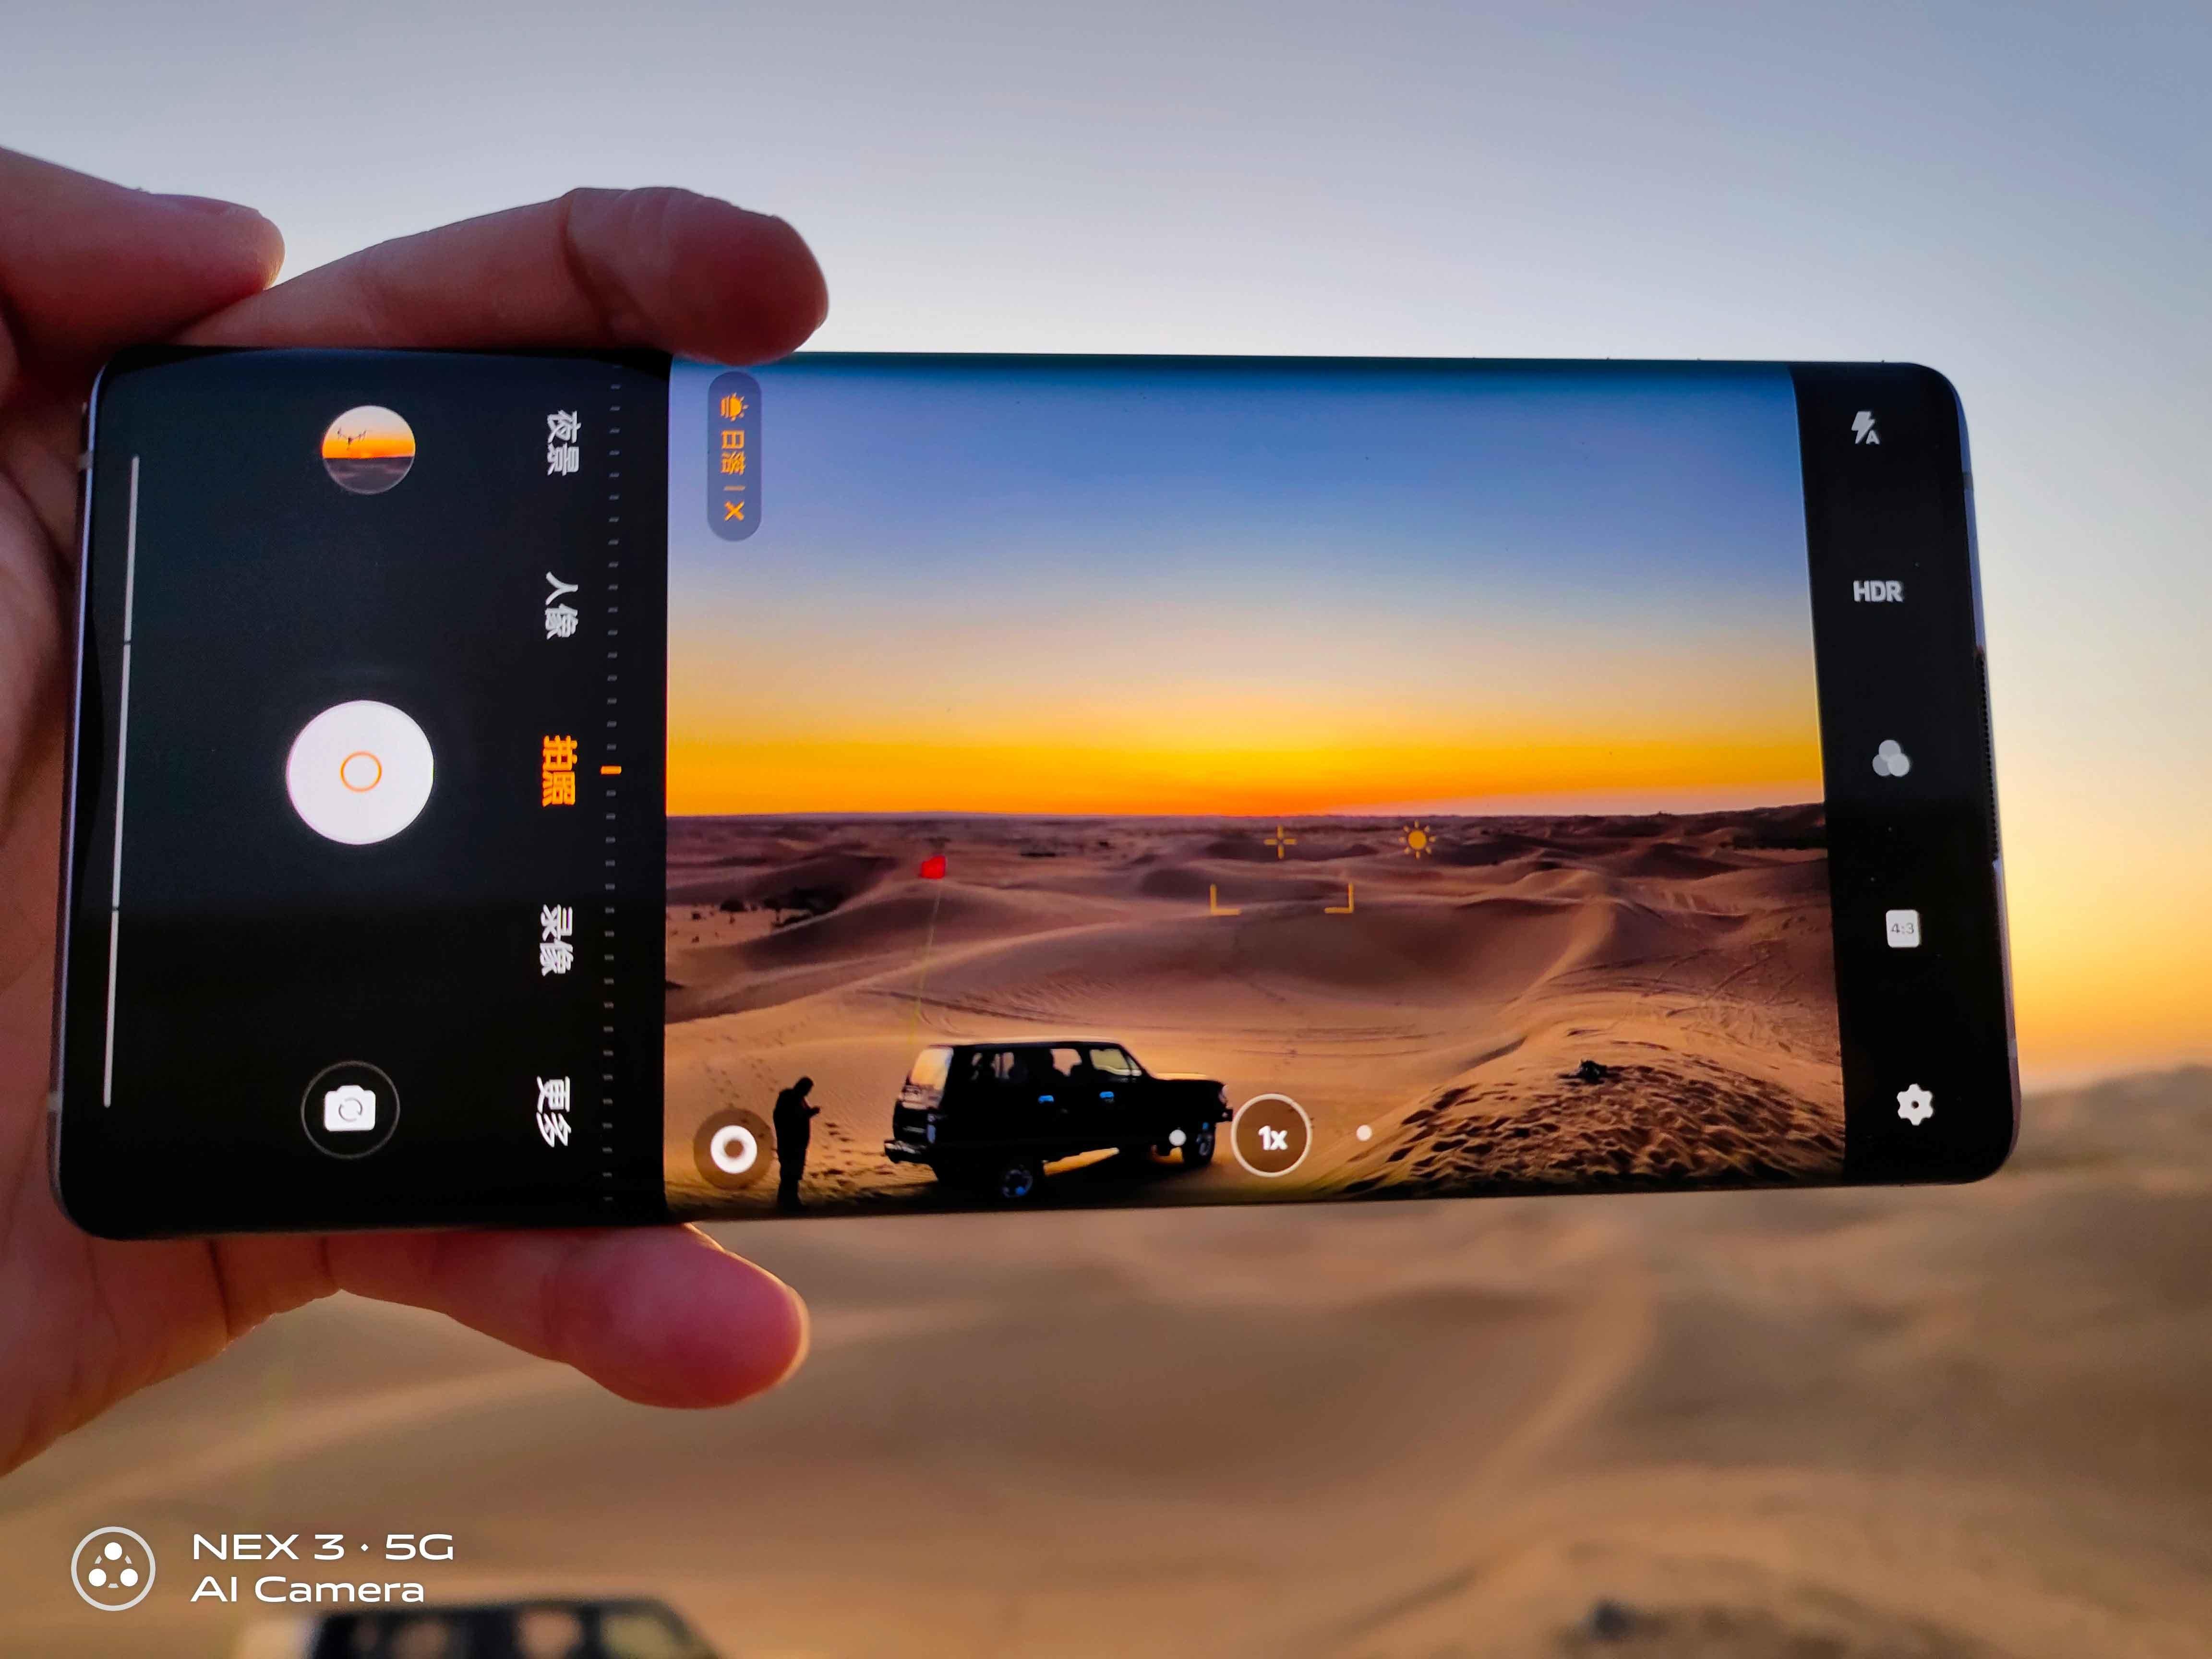 vivoNEX3(8+128GB)手机拍照出来的影像图第2张